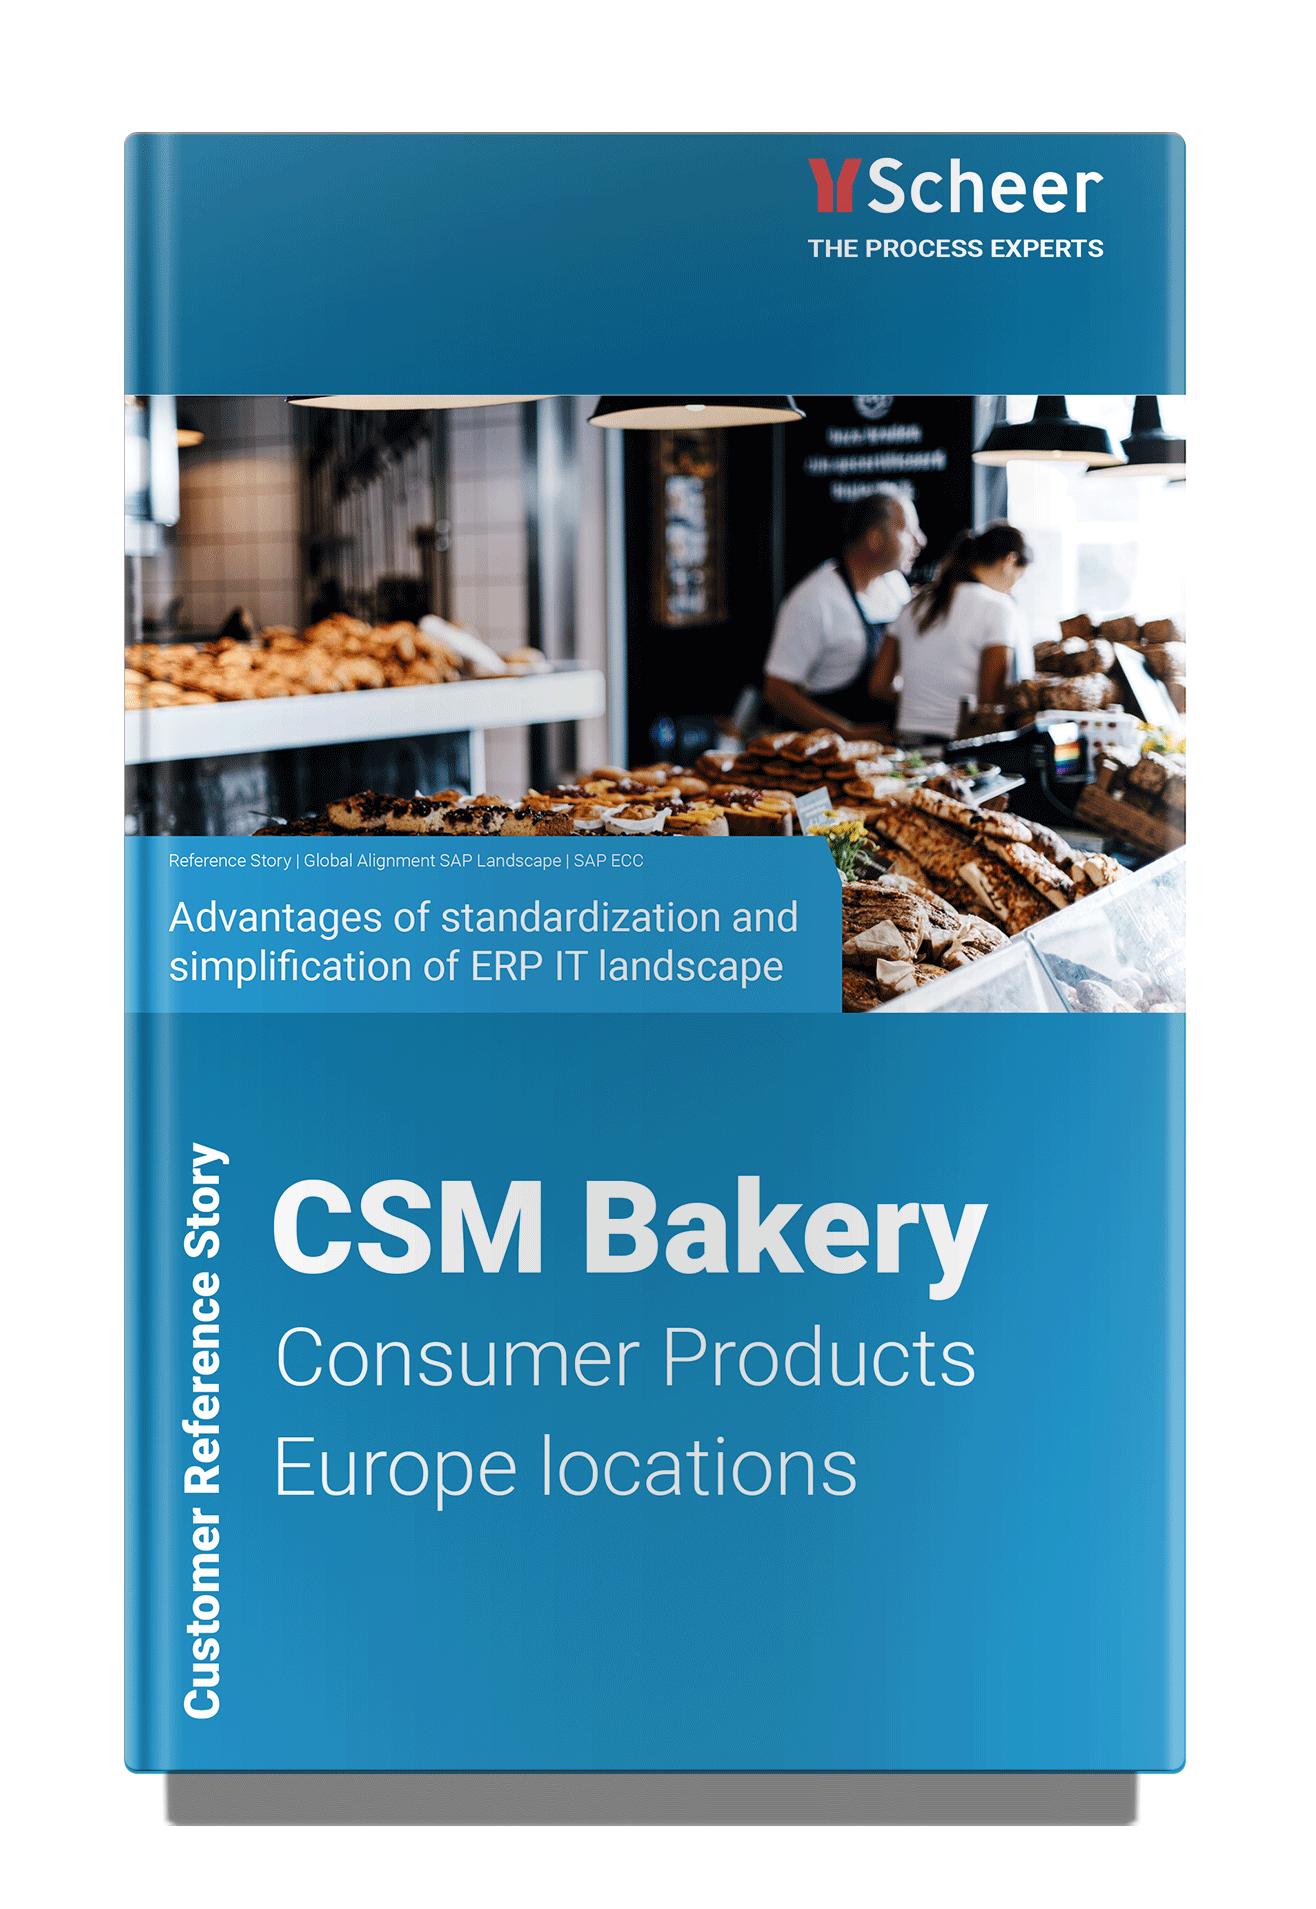 CSM Bakery Solution